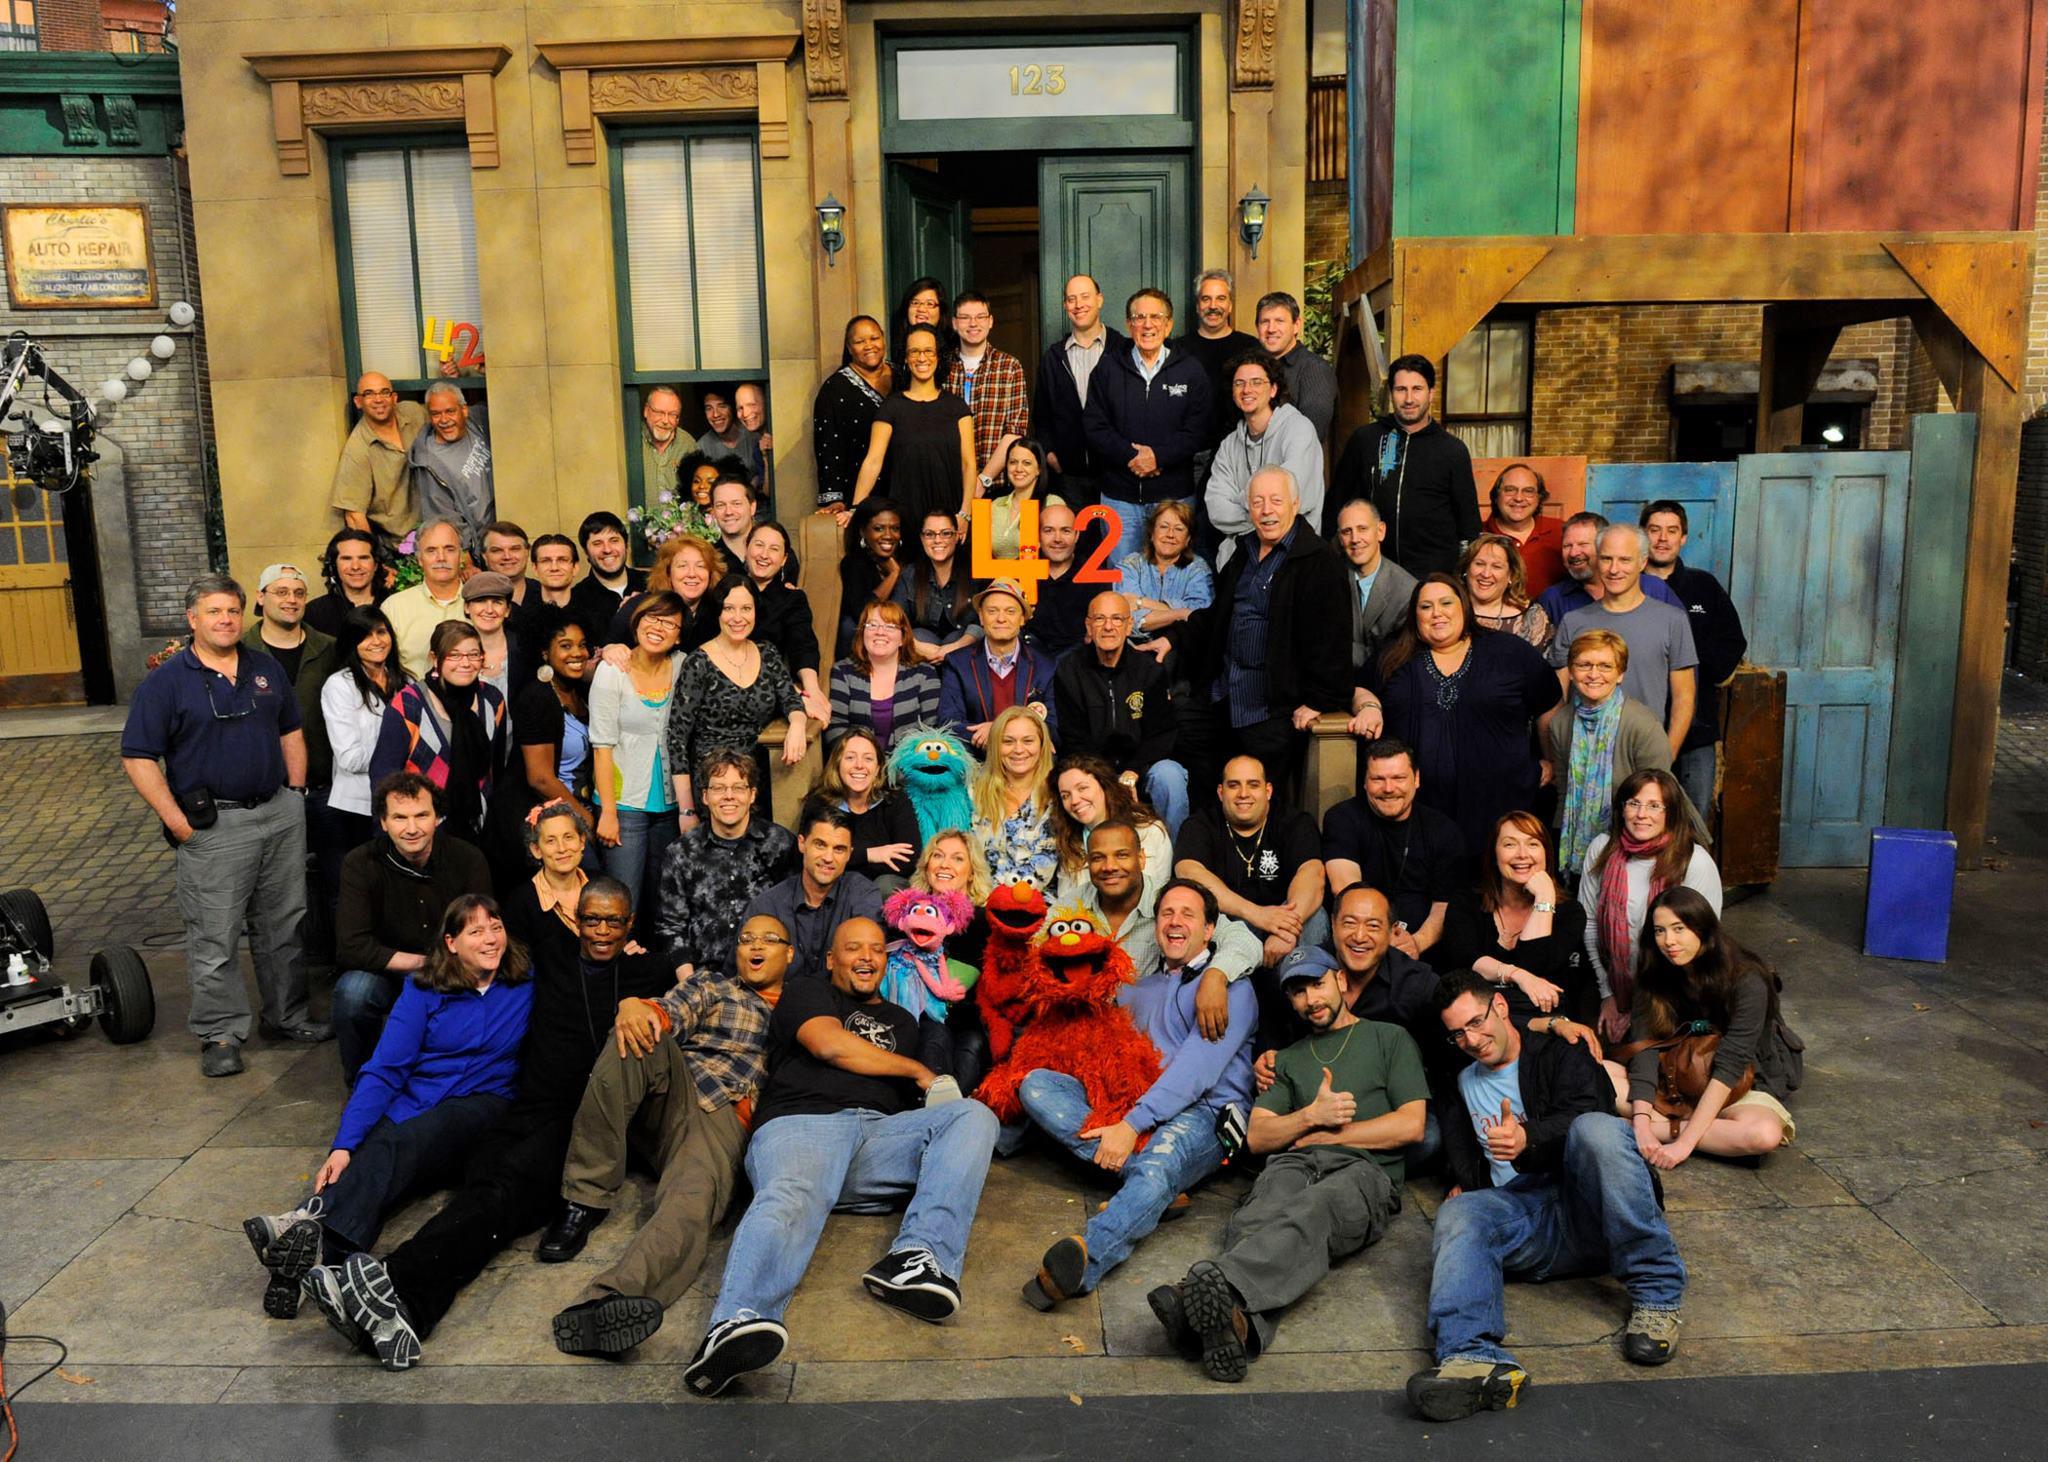 Sesame street episode guide 2011